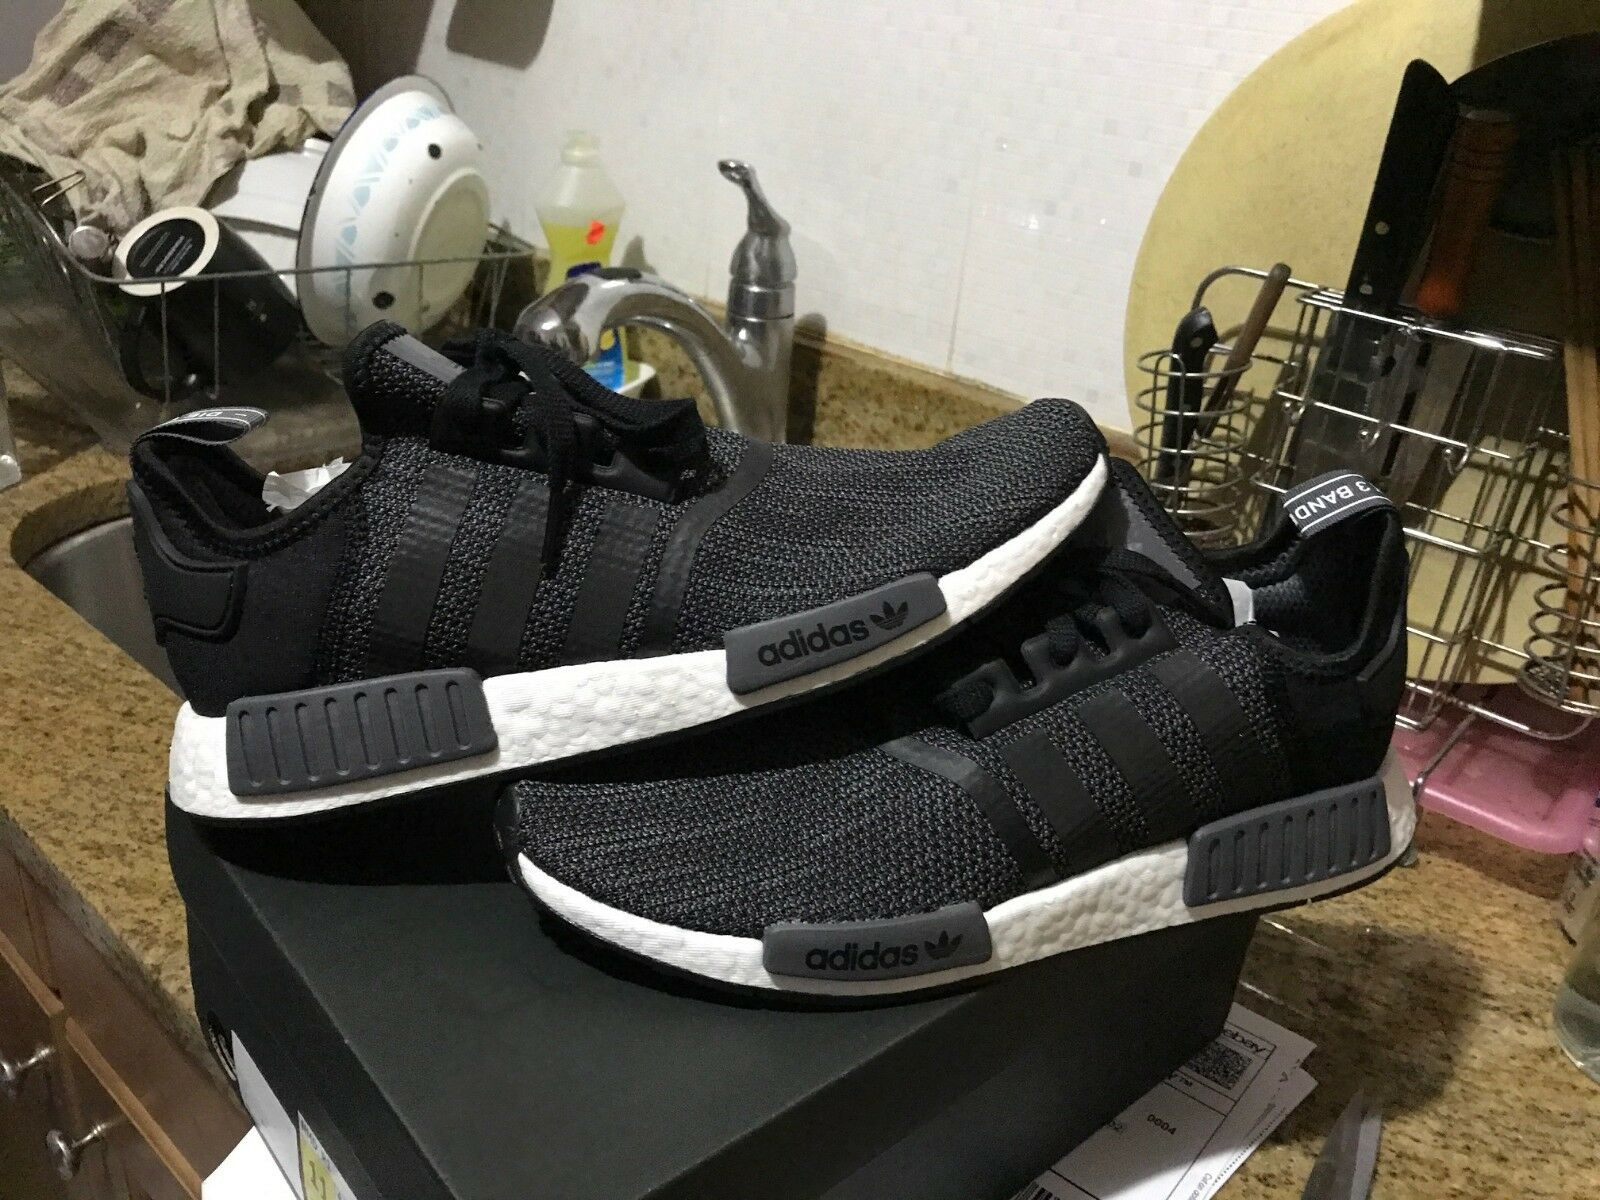 Adidas Originals NMD R1 Core Black Carbon B79758 Men